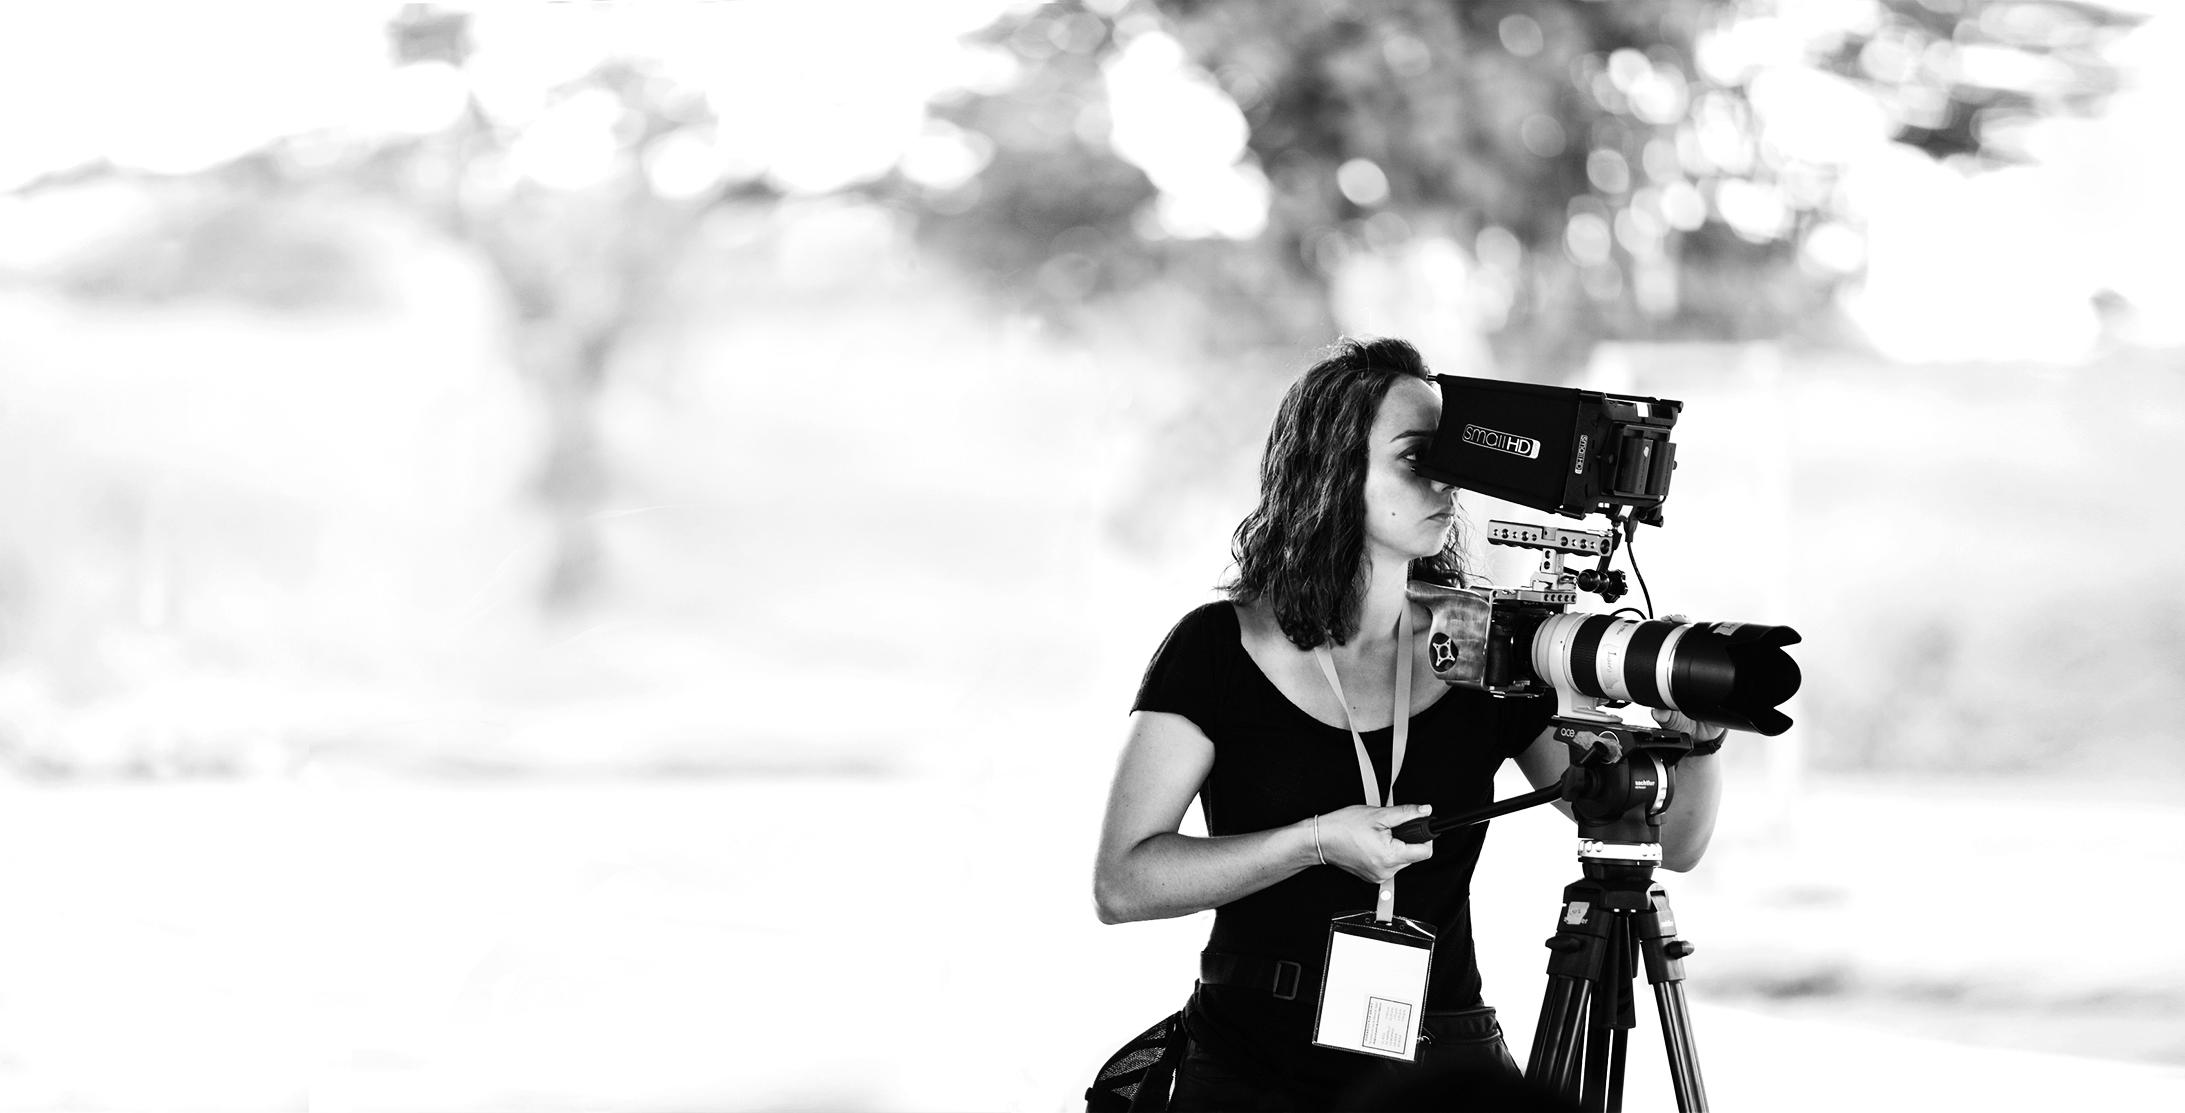 Laura-filming3.jpg